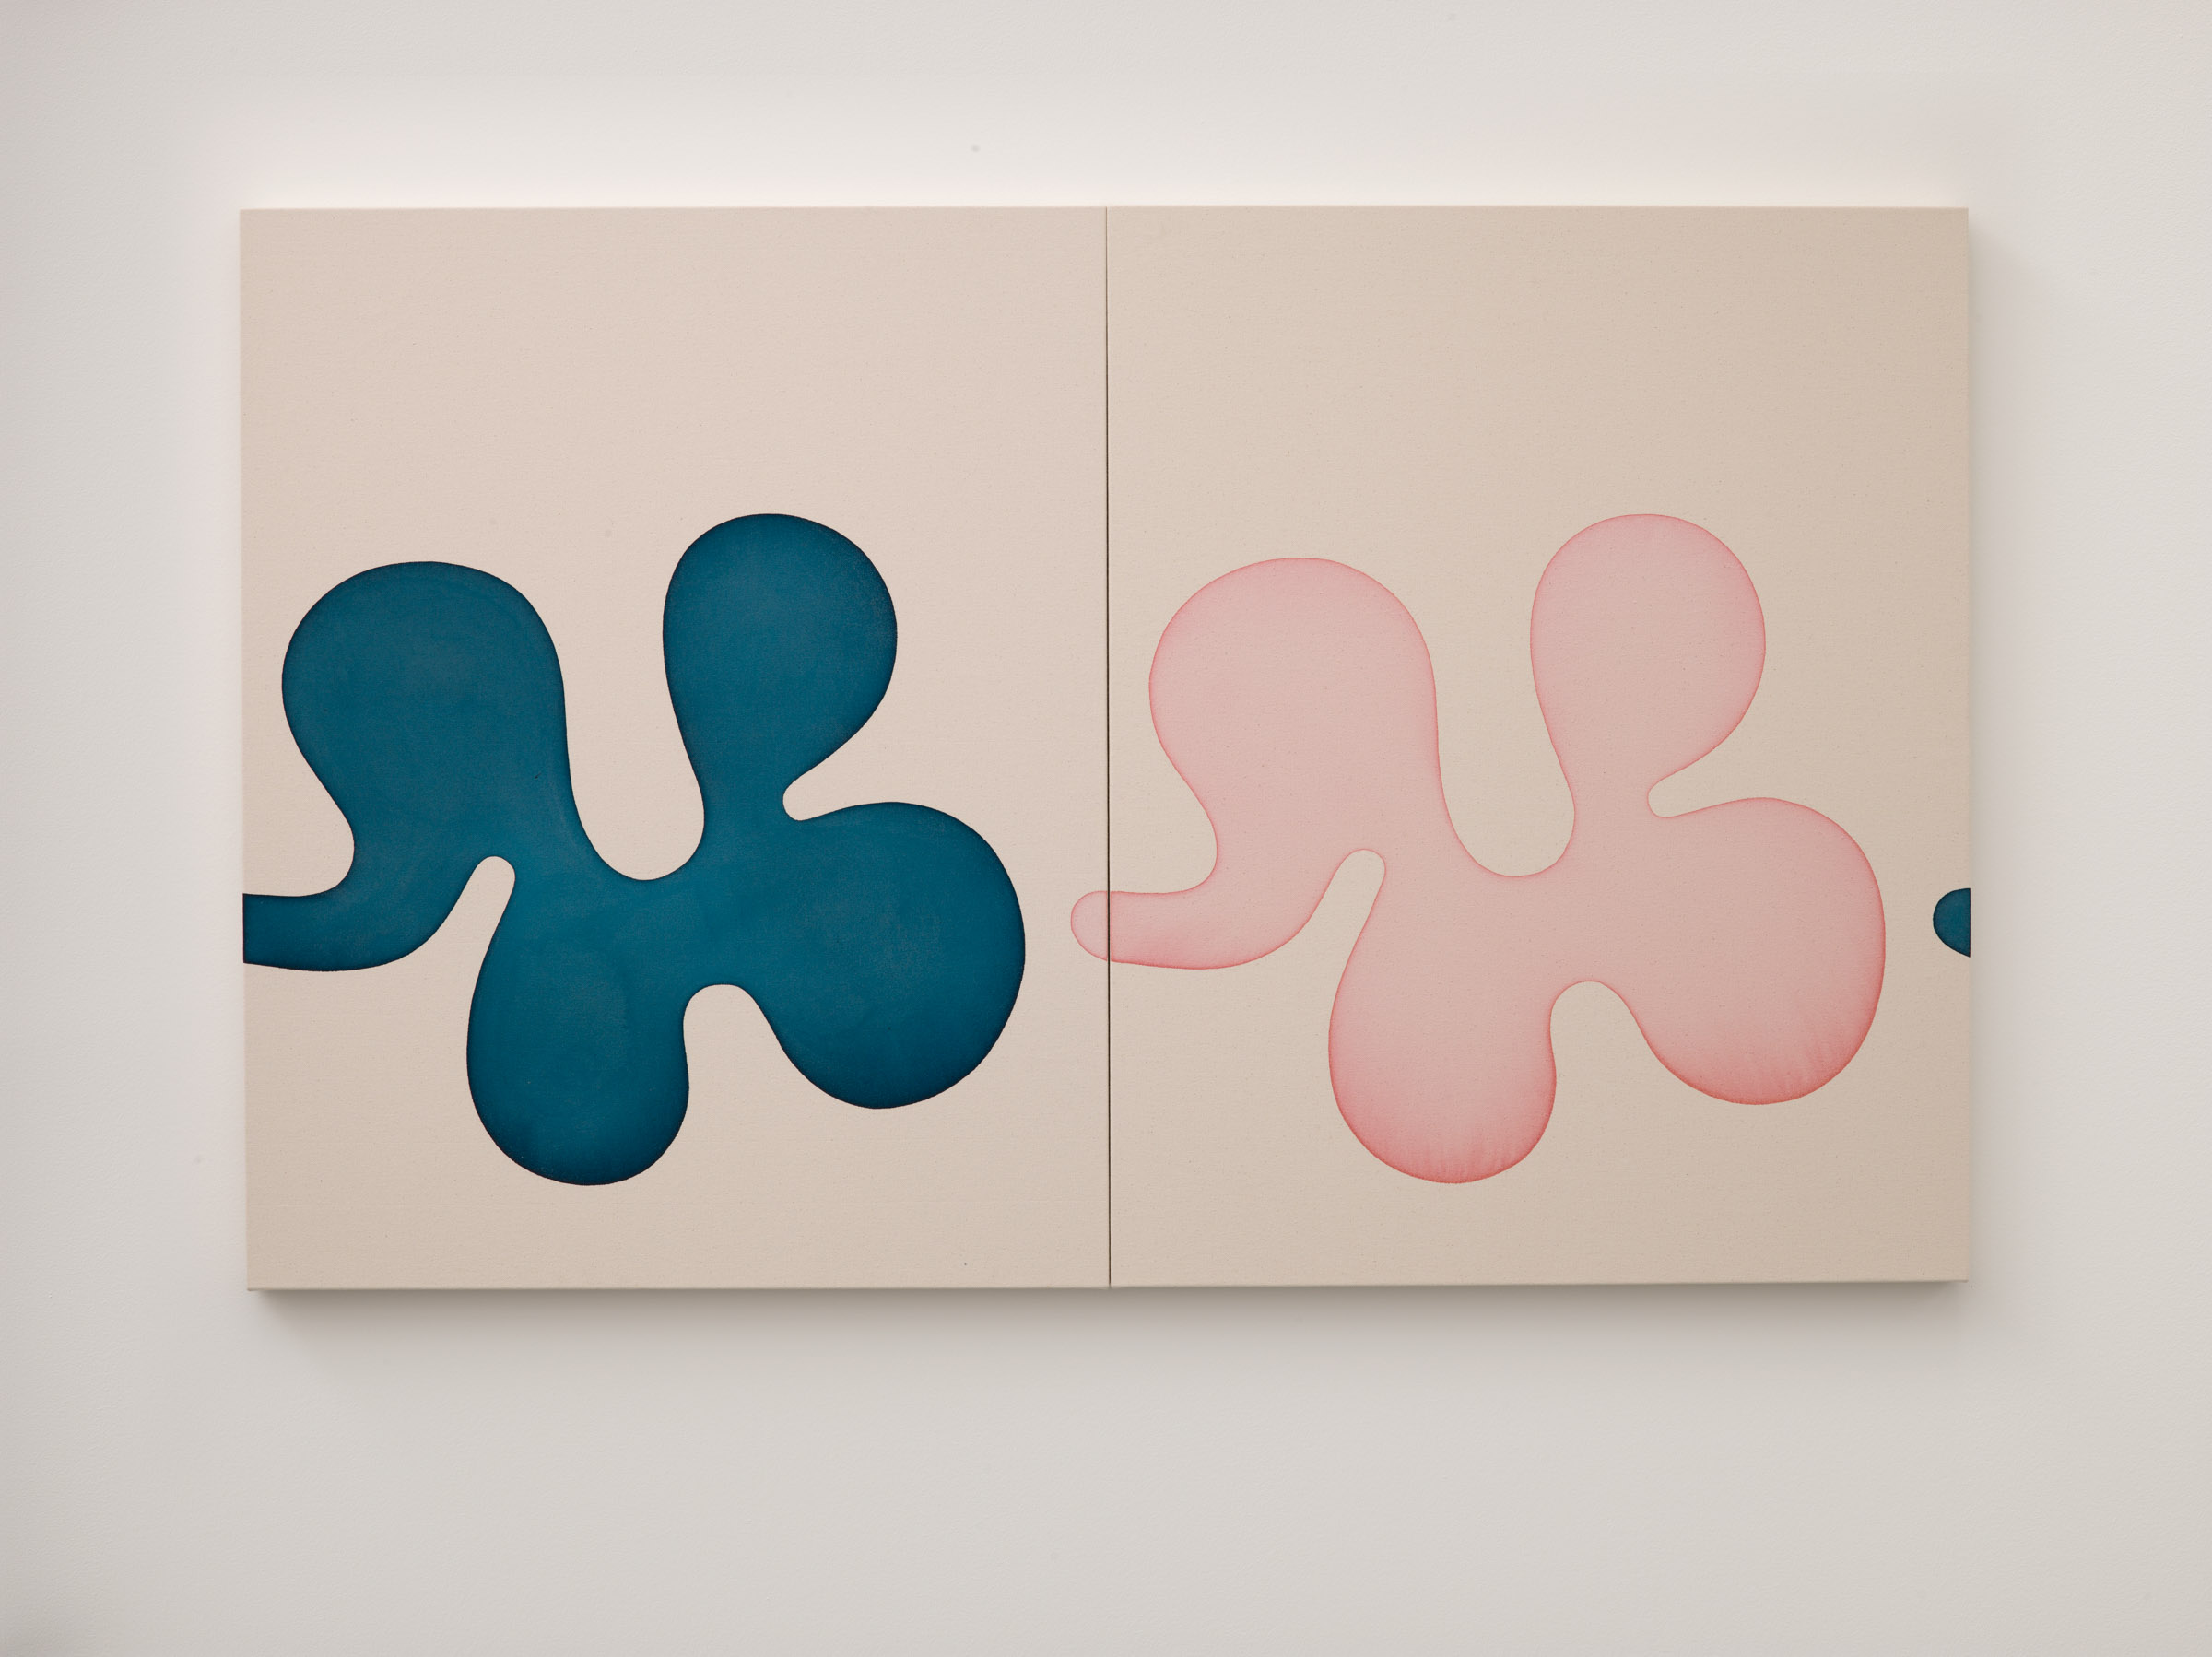 Exhibition: Landon Metz